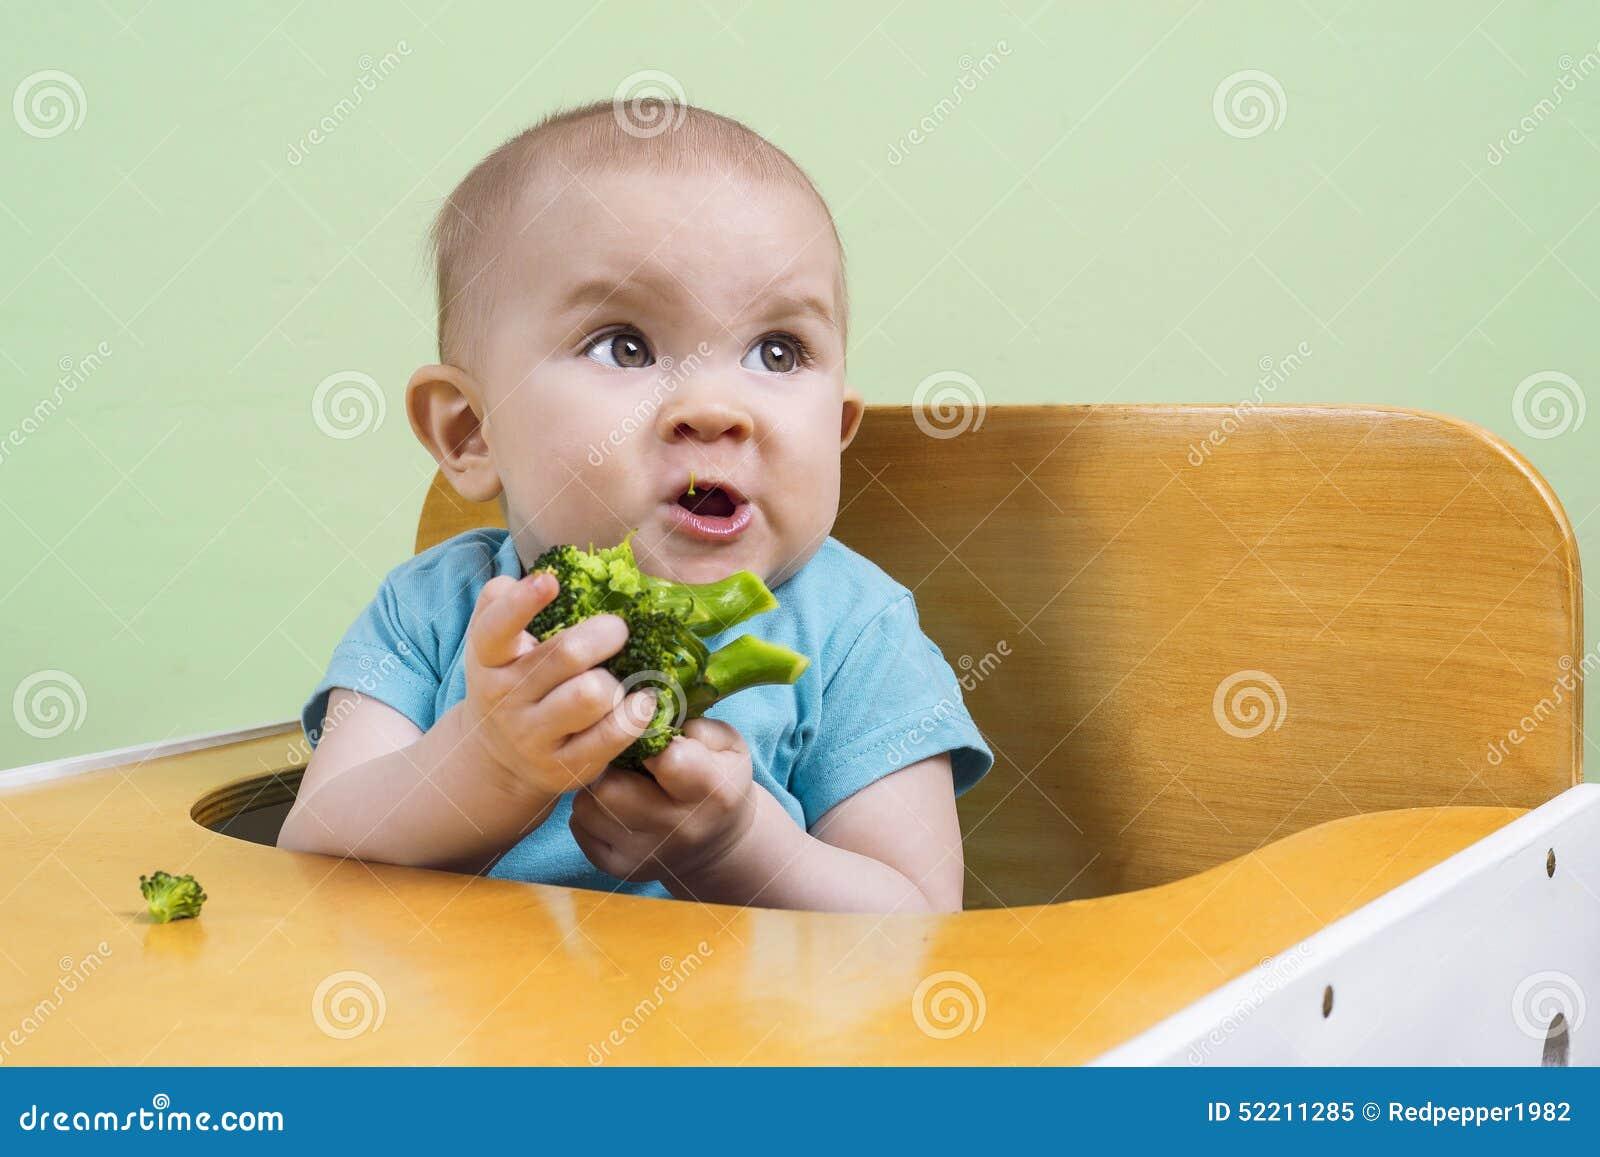 Baby doesn t like broccoli stock image. Image of human ...